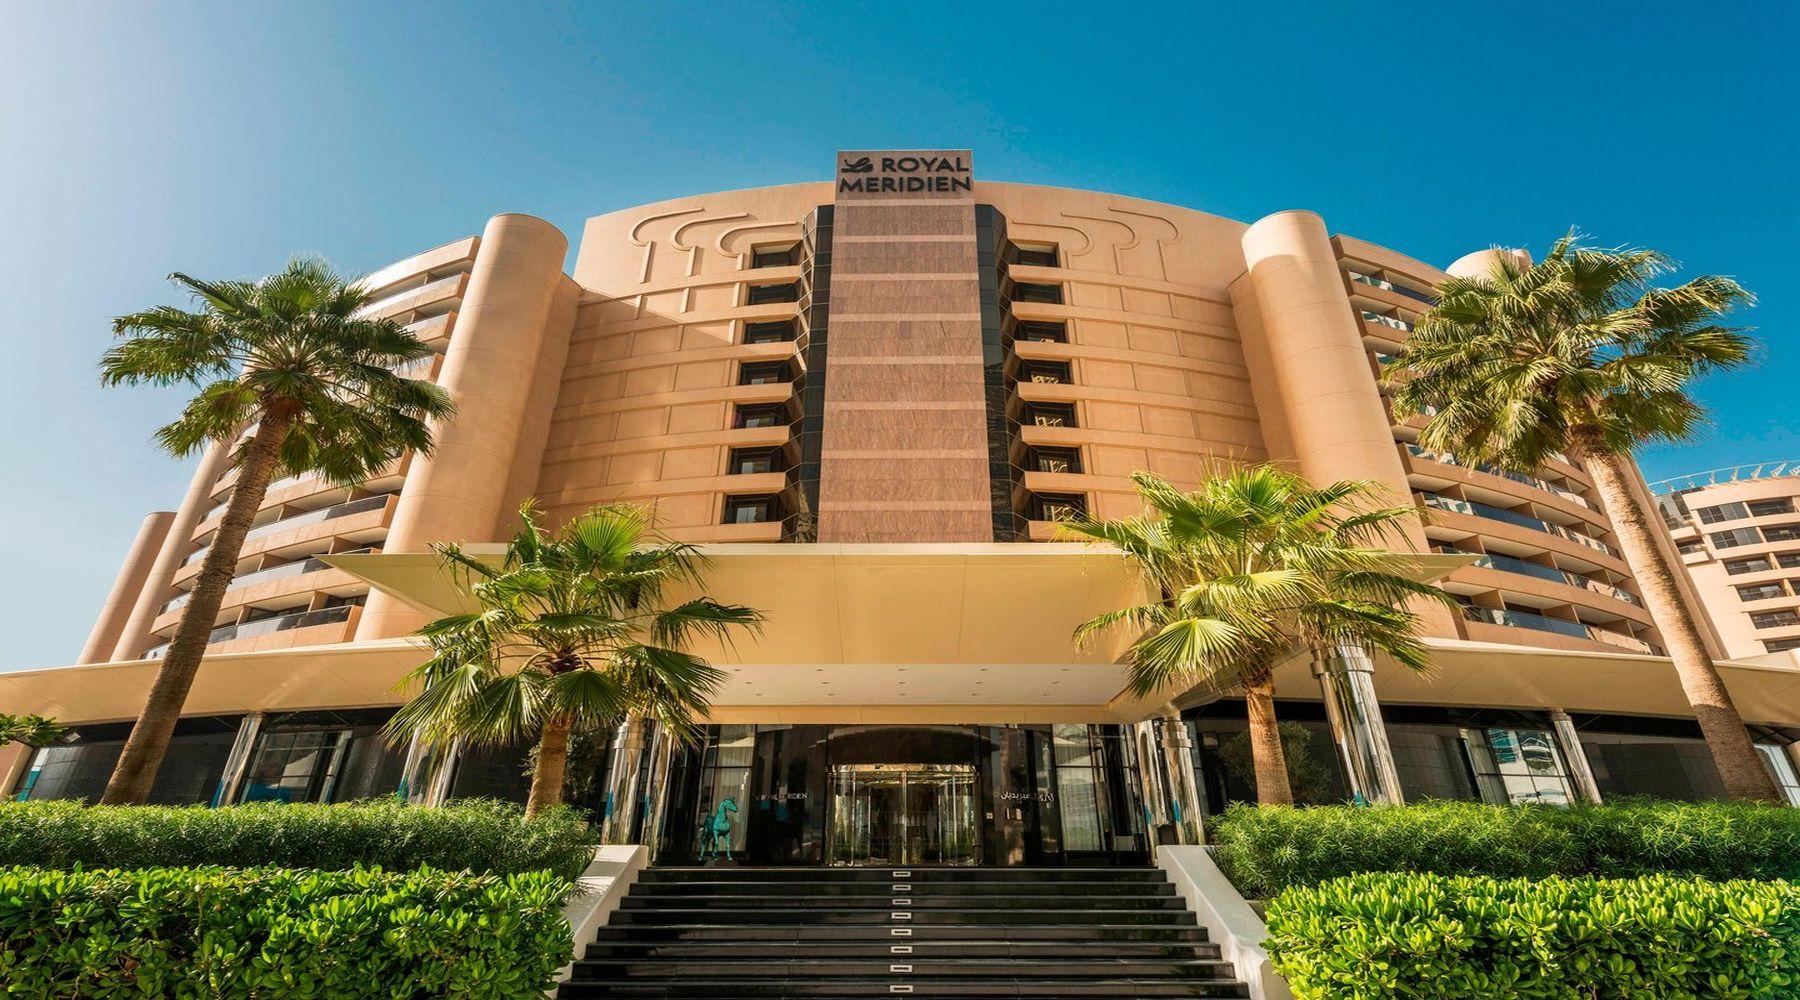 Le Royal Meridien Beach Resort and Spa, Dubaj